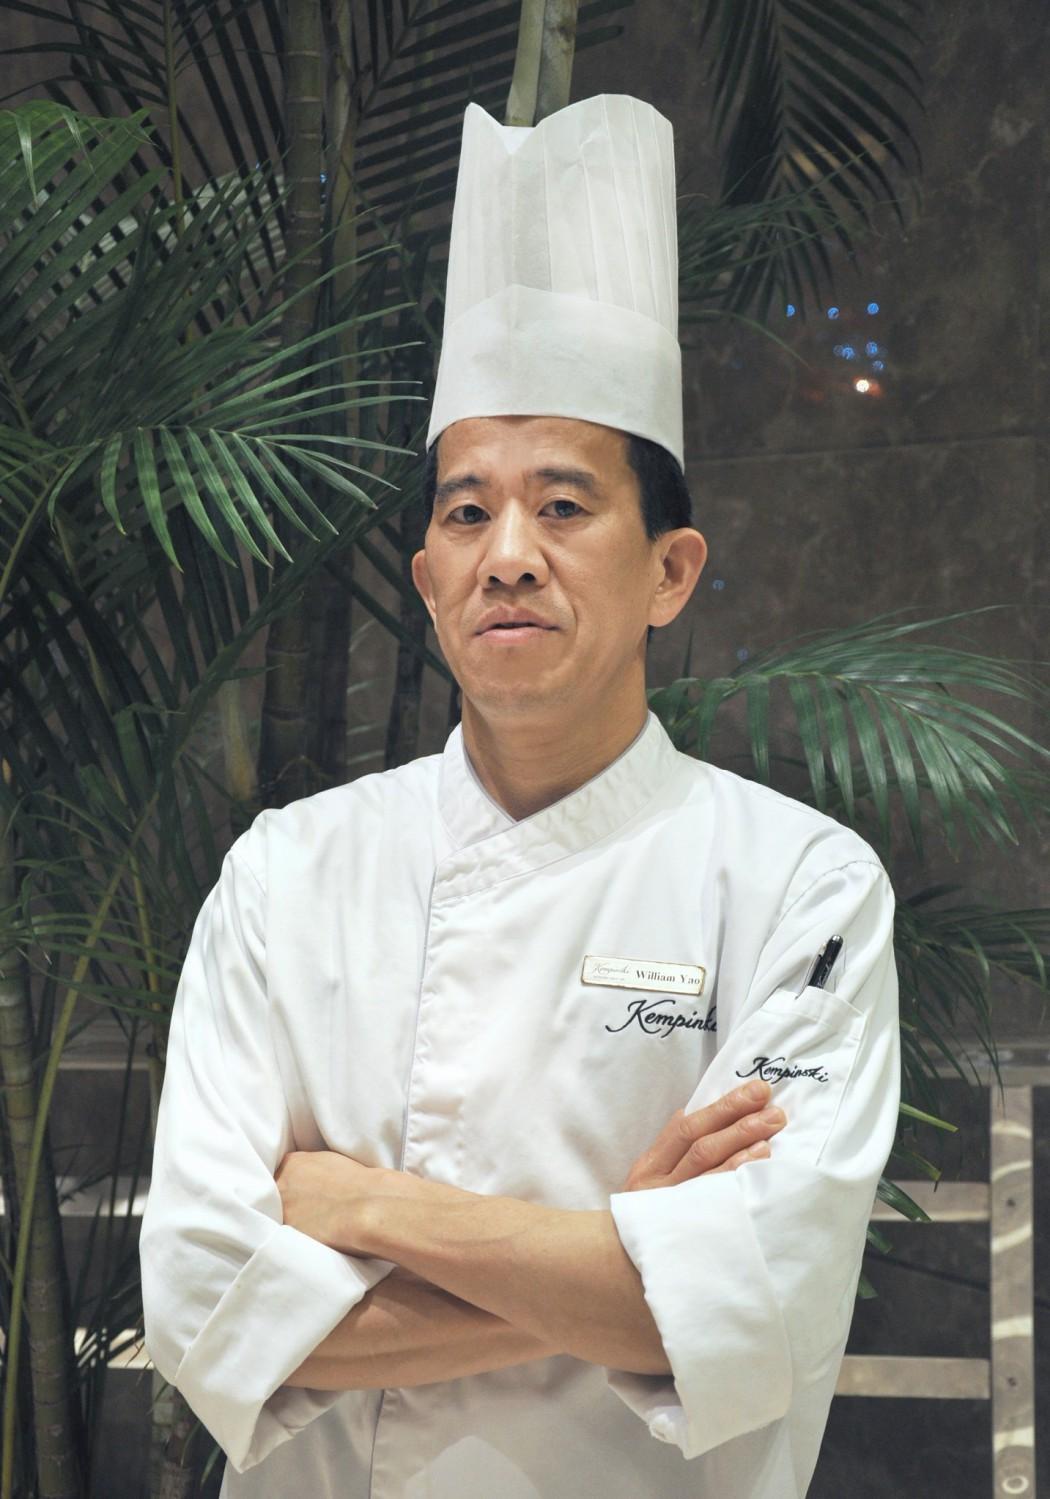 Mein Schiff Gastkoch: William Yao vom Kempinski Grand Hotel Shanghai